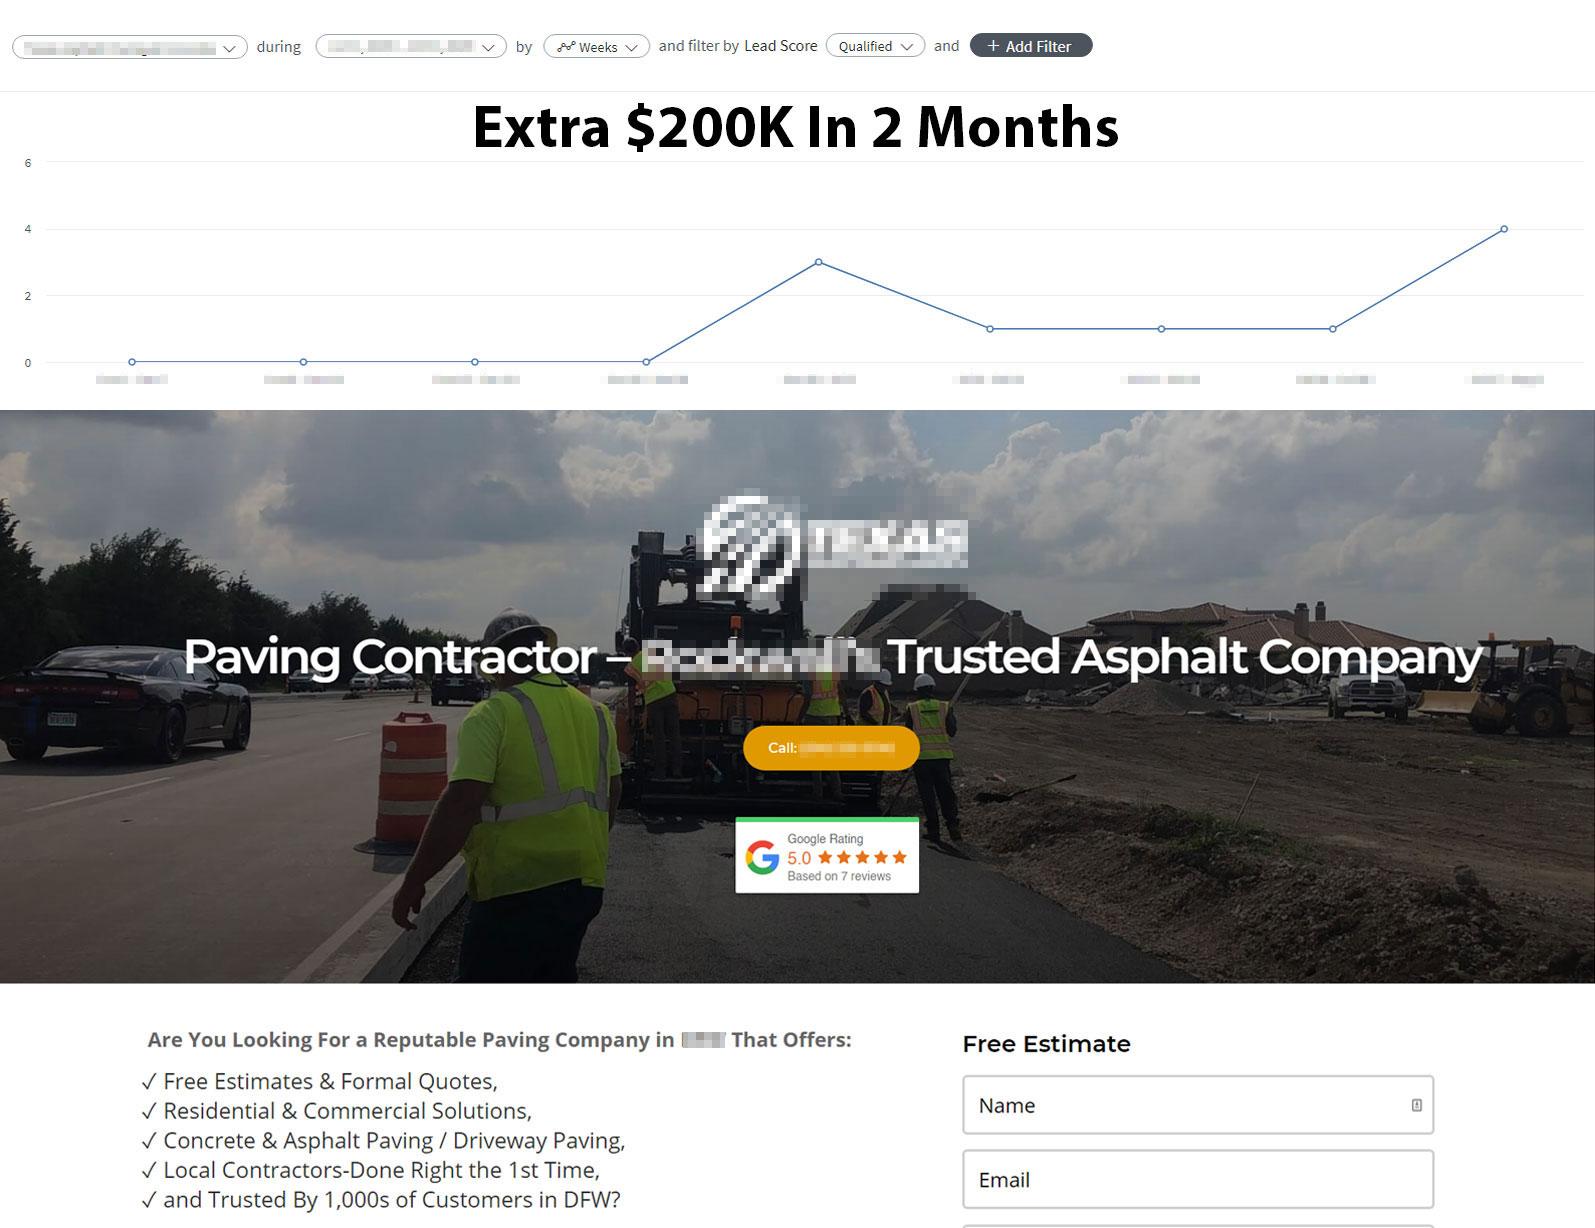 online marketing asphalt paving concrete contractor digital marketing services best companies near me innovative marketing 2